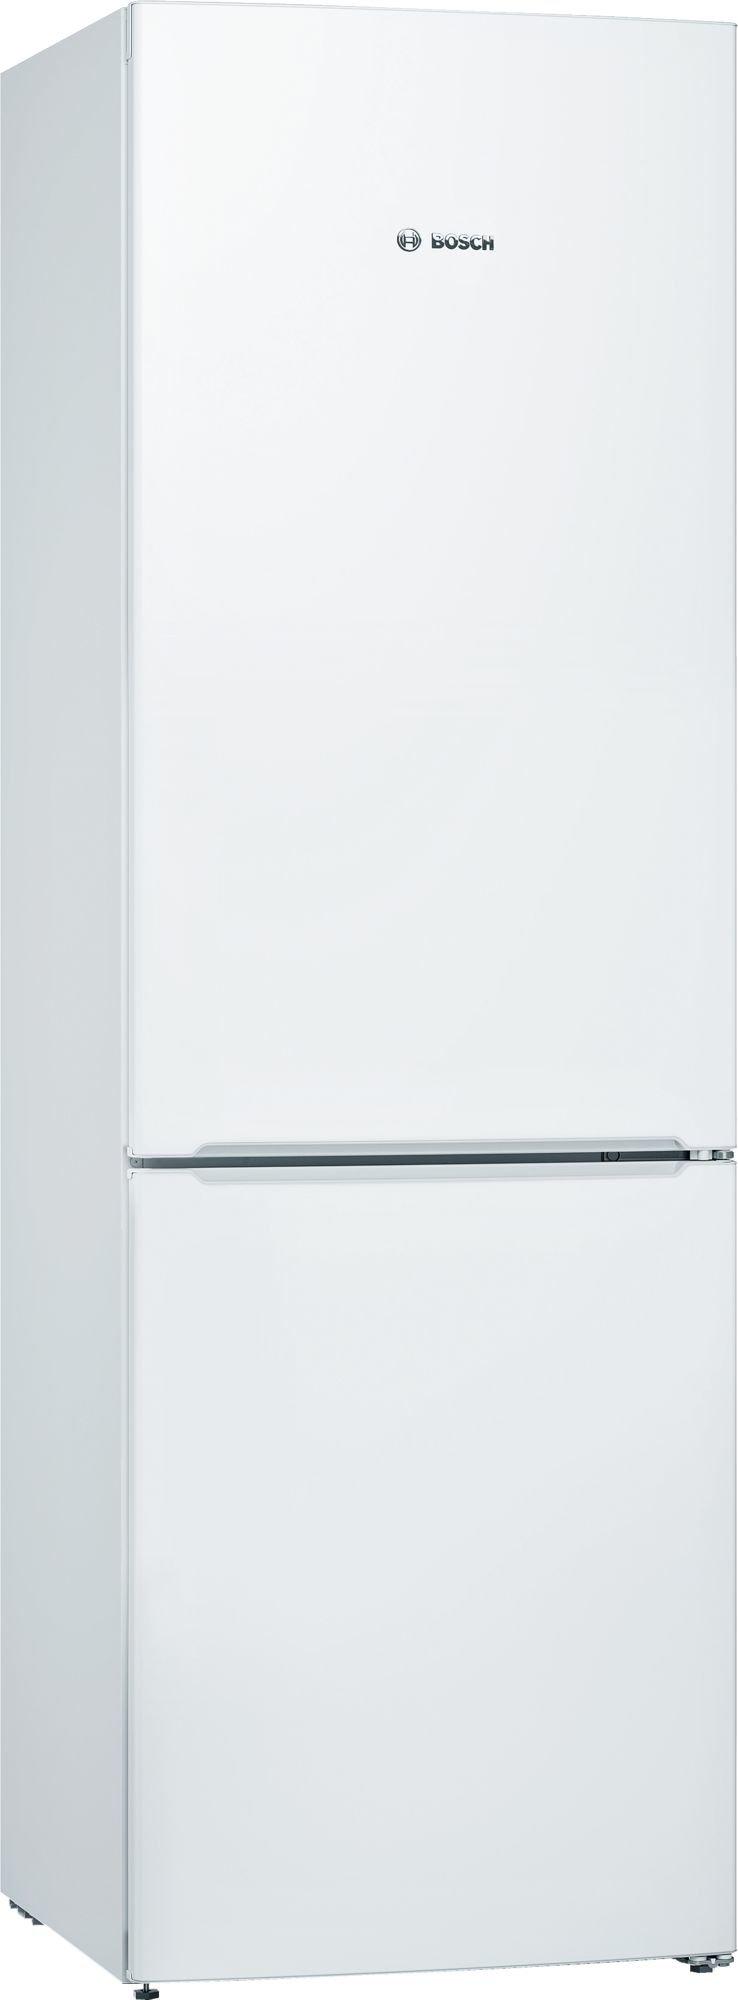 Холодильник Bosch kgv 36nw1ar